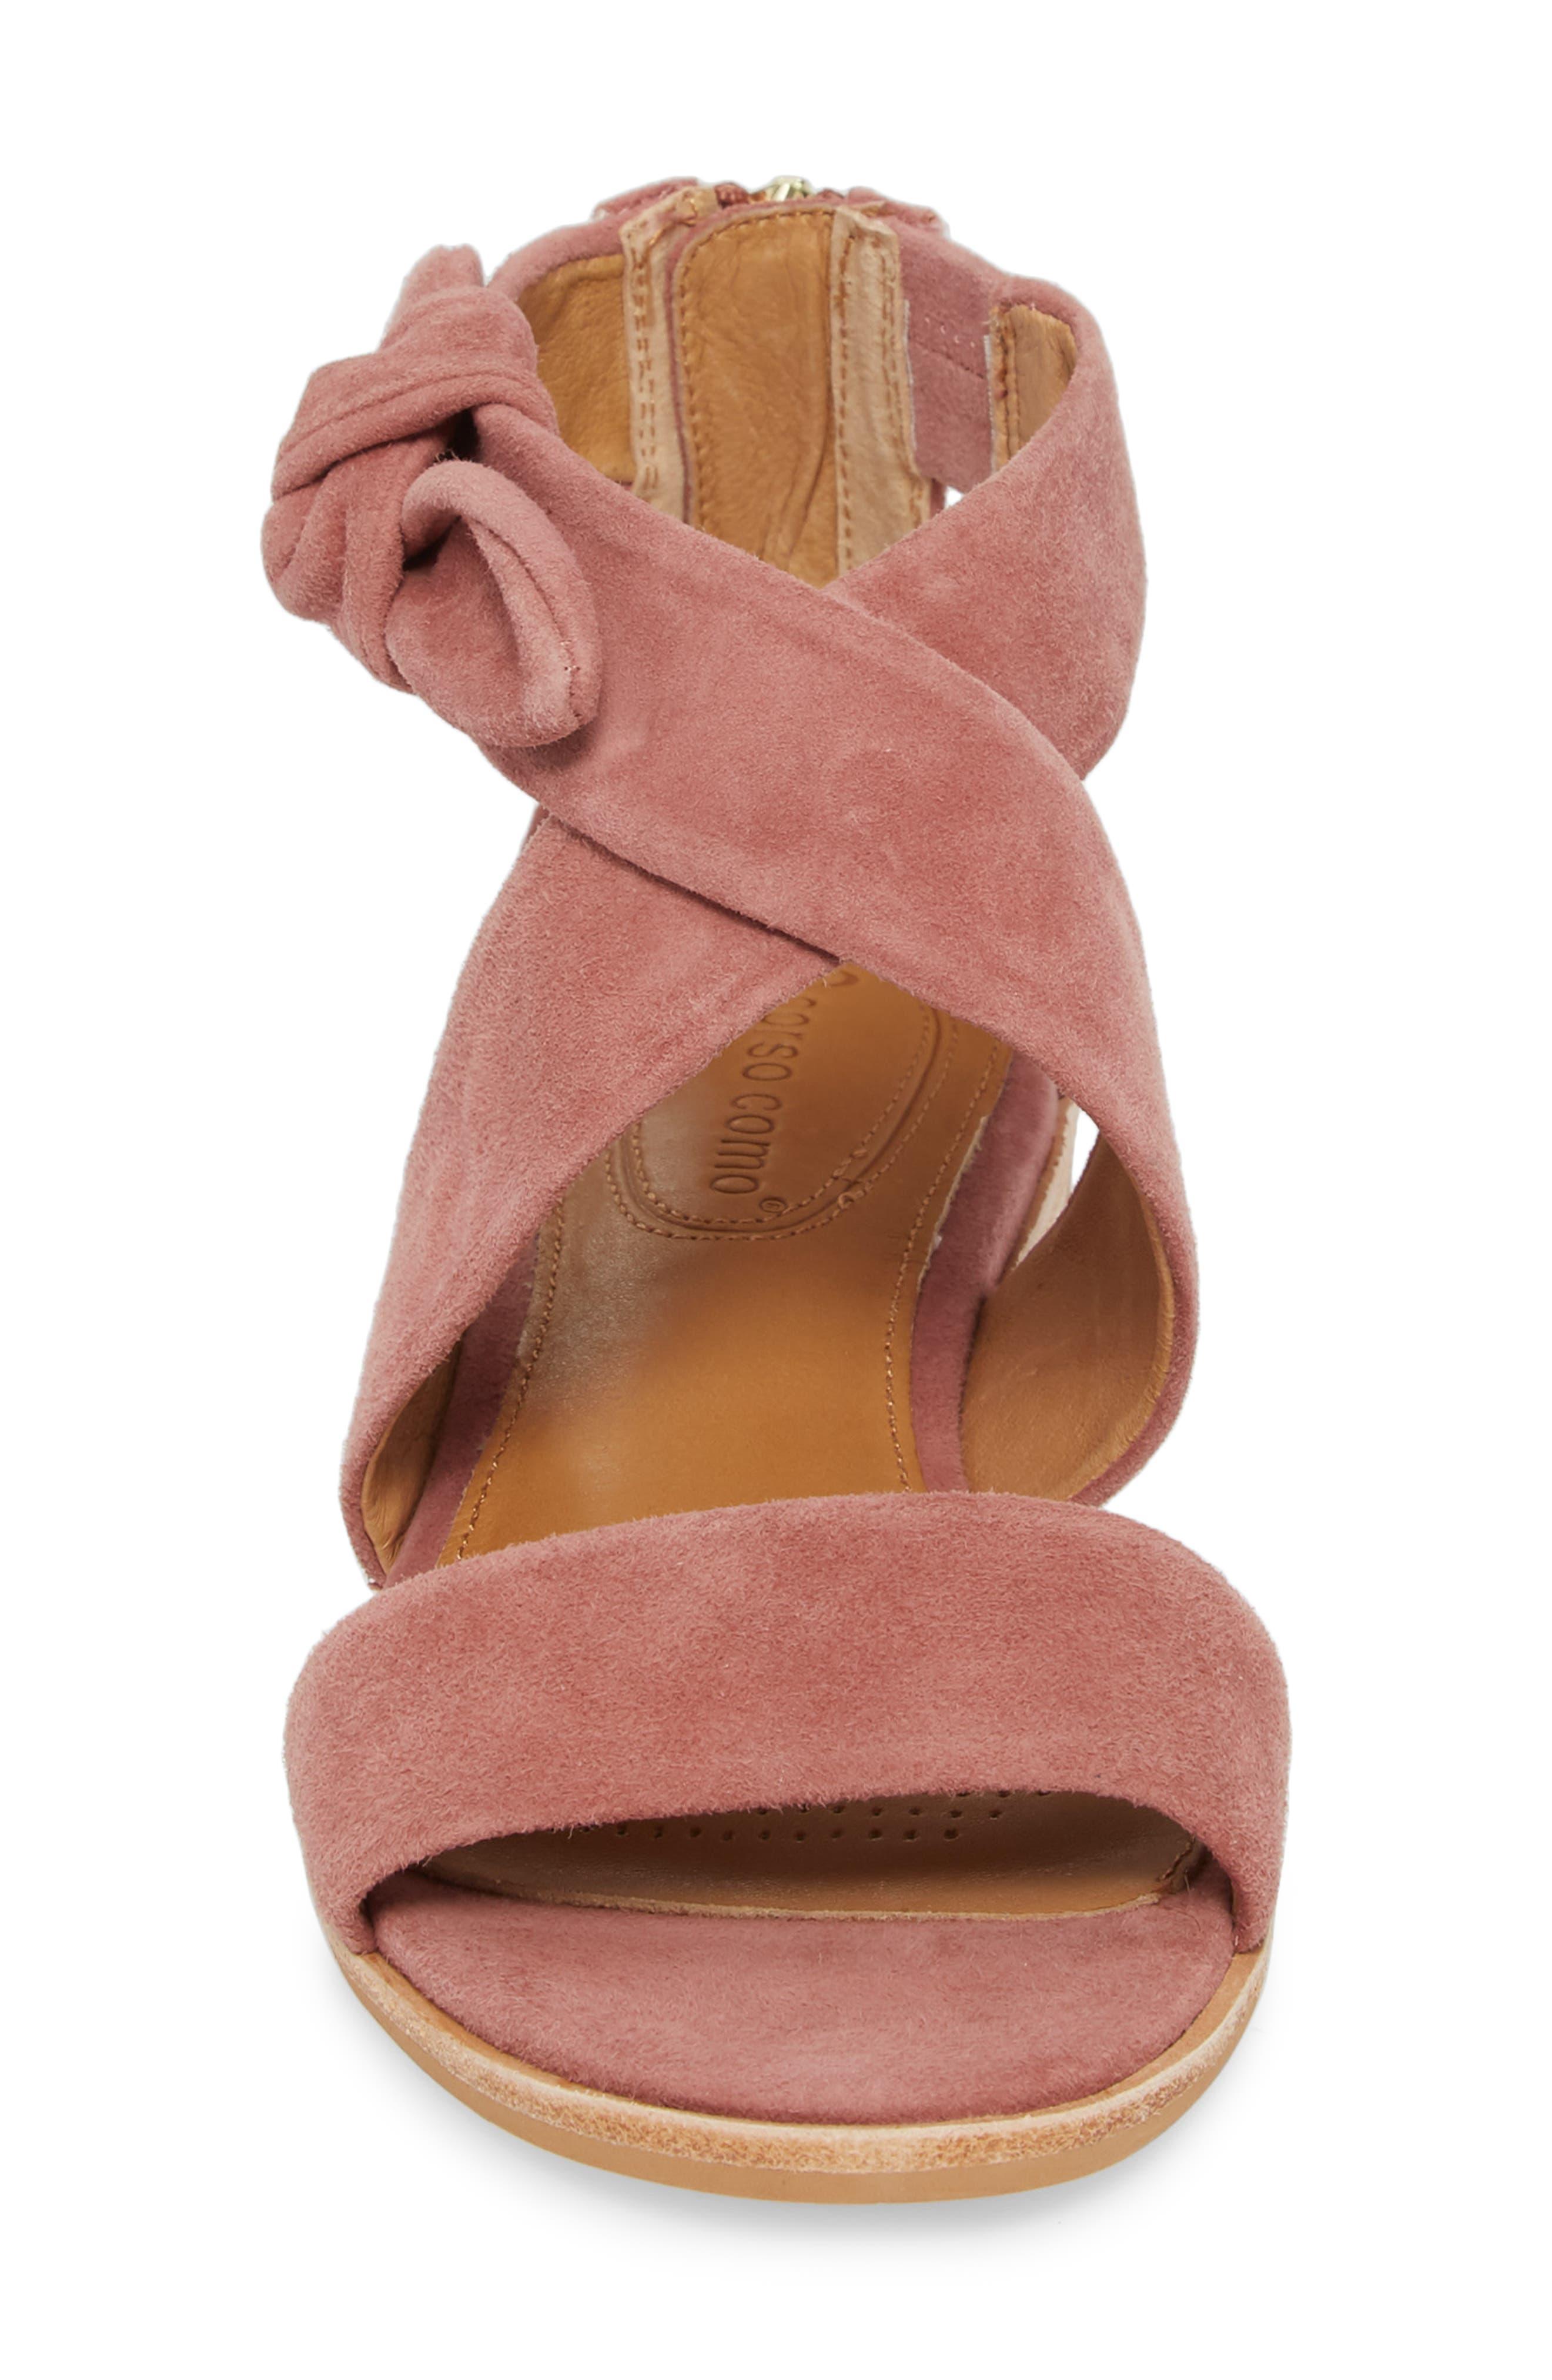 Rasque Sandal,                             Alternate thumbnail 4, color,                             Old Rose Leather